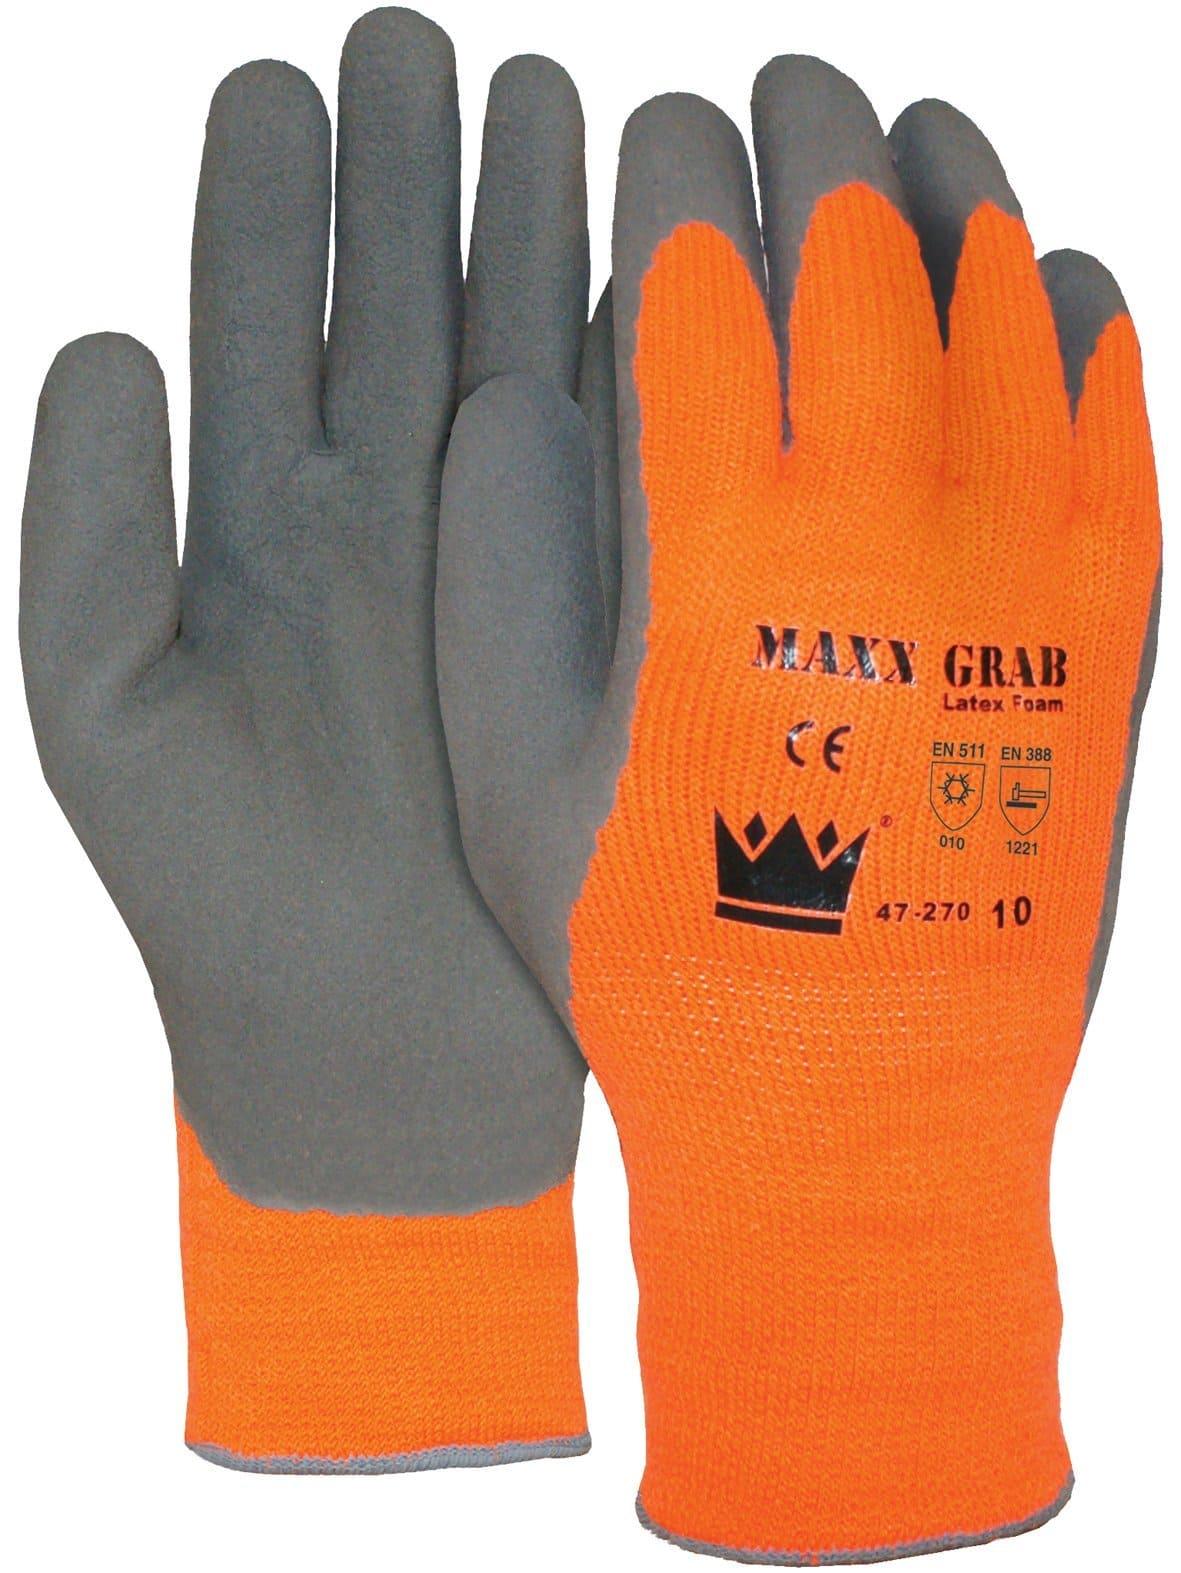 M-Safe Maxx Grab winterfoam 47-270 handschoenen - 12 paar